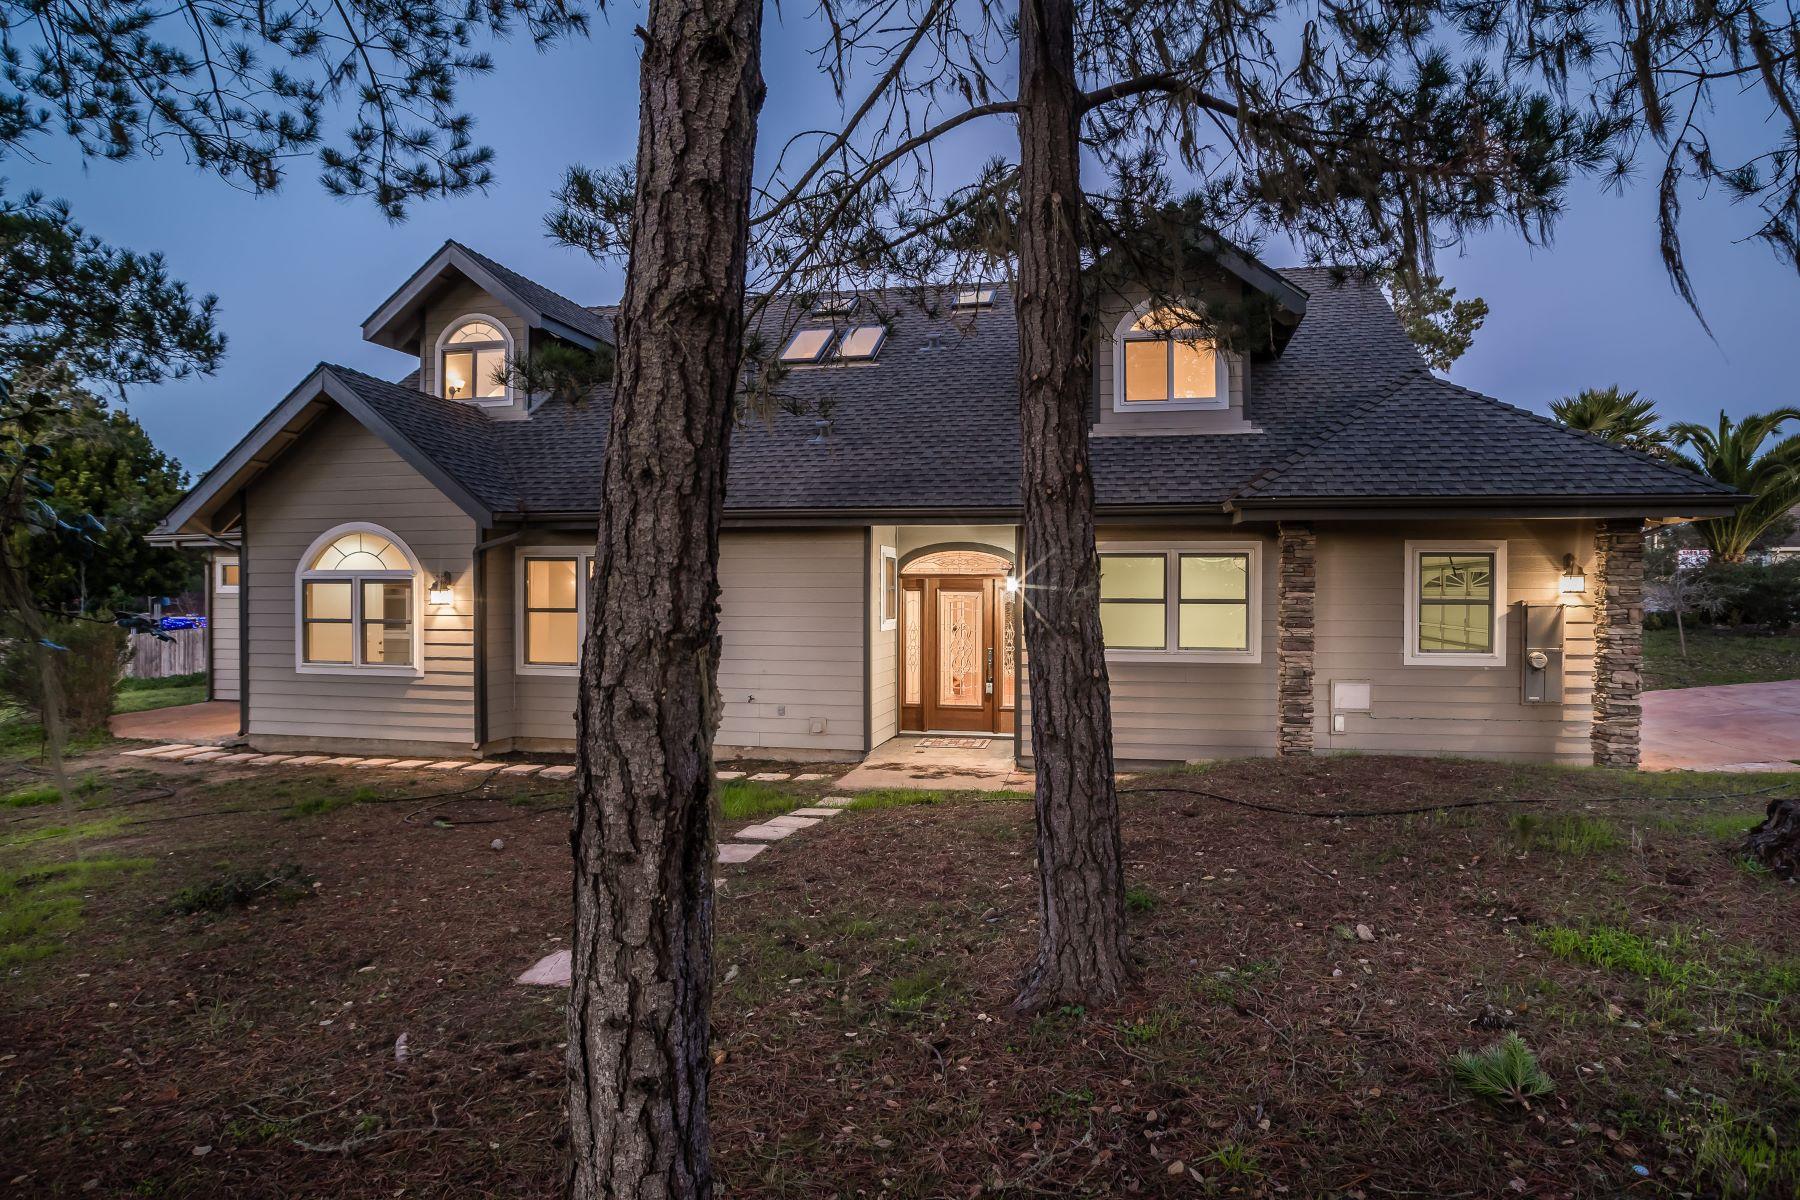 Single Family Homes for Sale at A Cambria Beauty 2825 Burton Drive Cambria, California 93428 United States